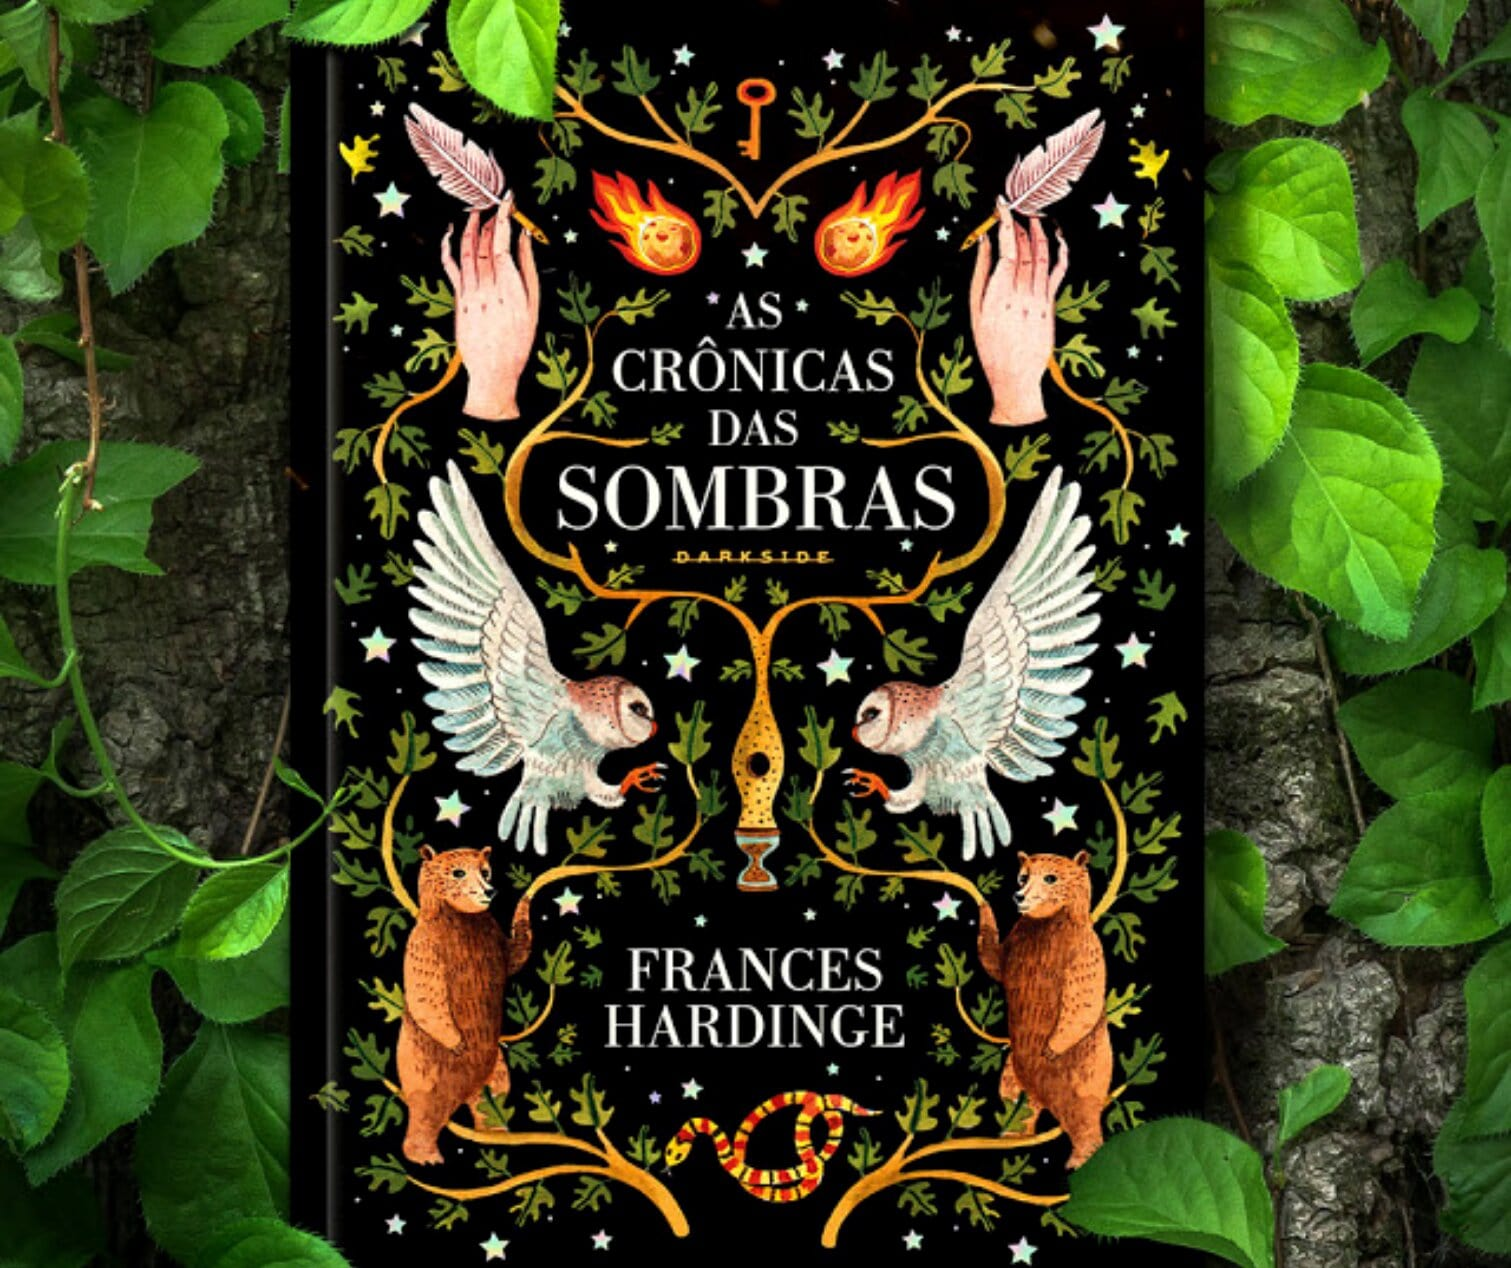 Resenha: As Crônicas das Sombras, de Frances Hardinge